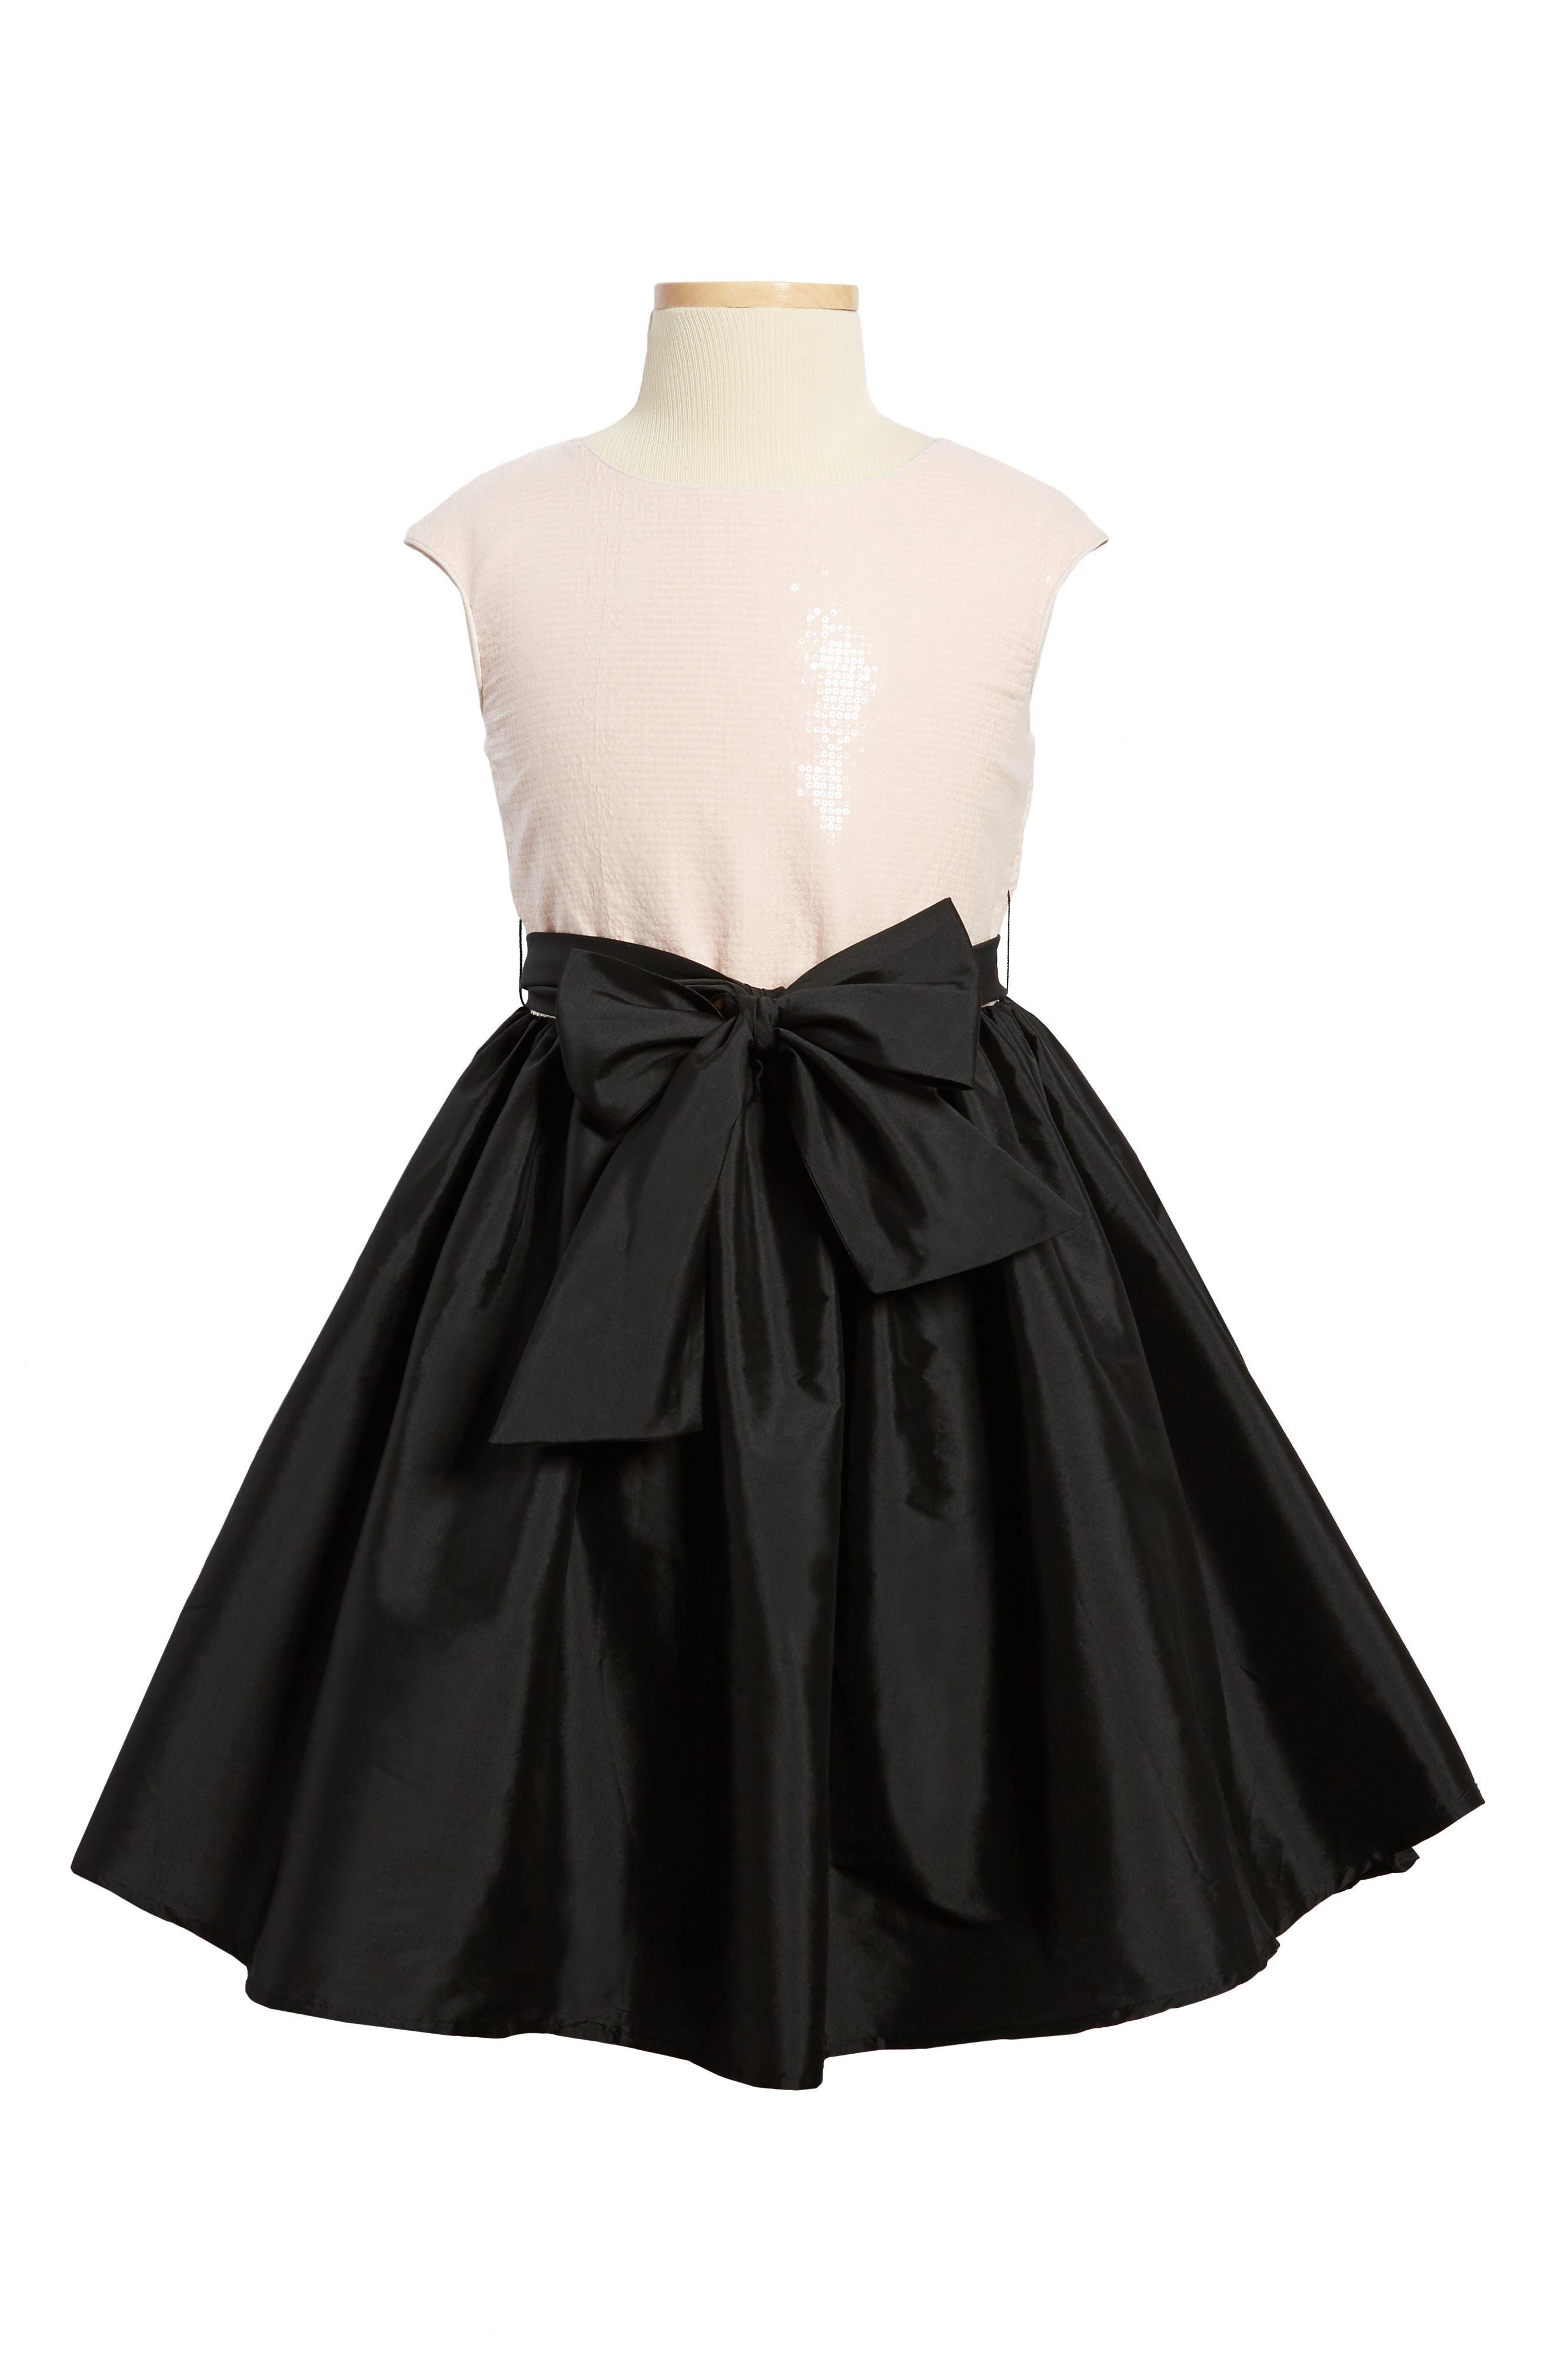 PIPPA & JULIE,                             Sequin Embellished Fit & Flare Dress,                             Main thumbnail 1, color,                             650